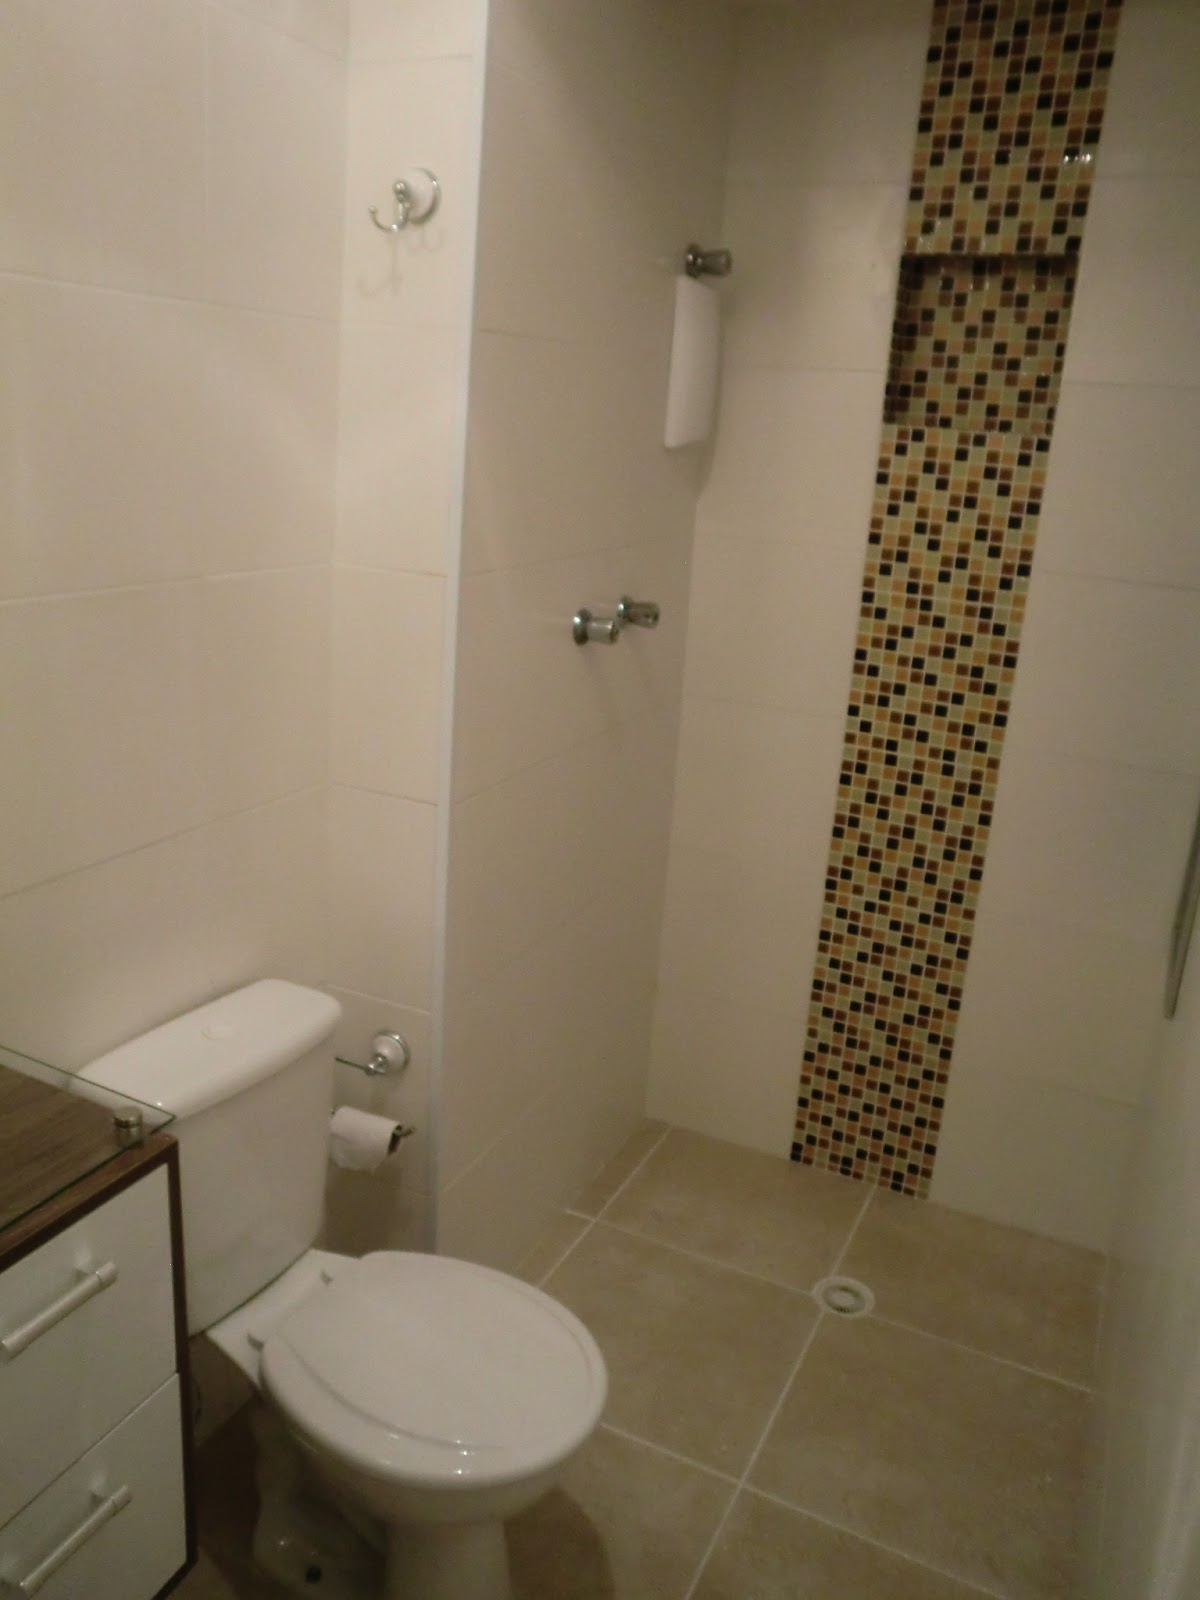 nicho de pastilhas de vidro dentro bo box do banheiro Casa e Reforma #392C19 1200x1600 Banheiro Branco E Marron